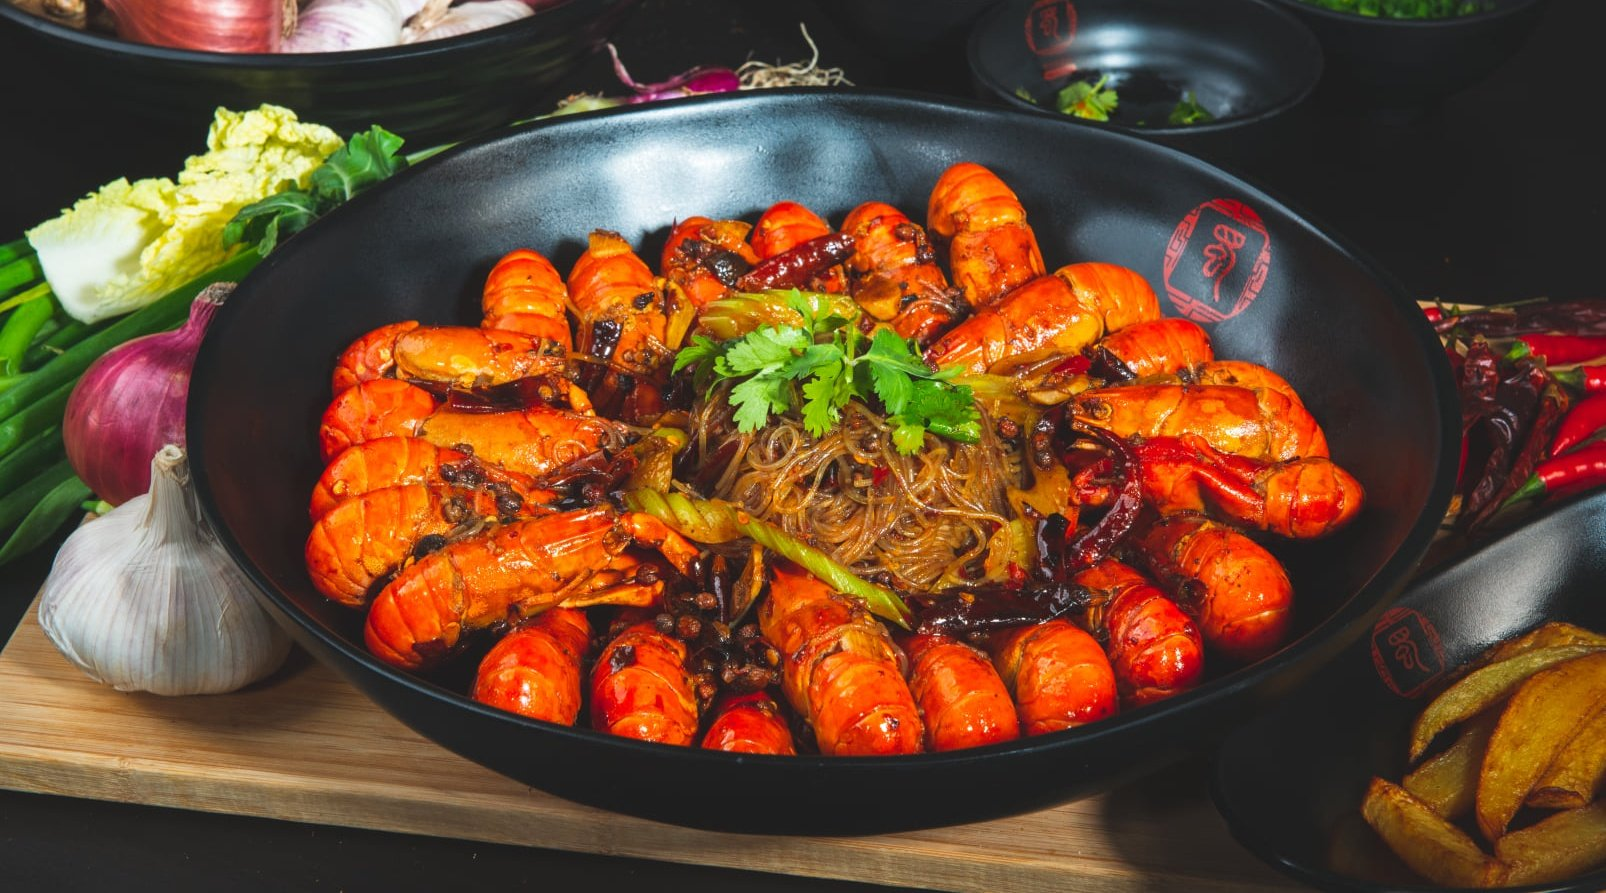 SHU Spicy Pot 蜀麻辣香锅 - Aman Suria-麻辣小龍蝦|1 公斤